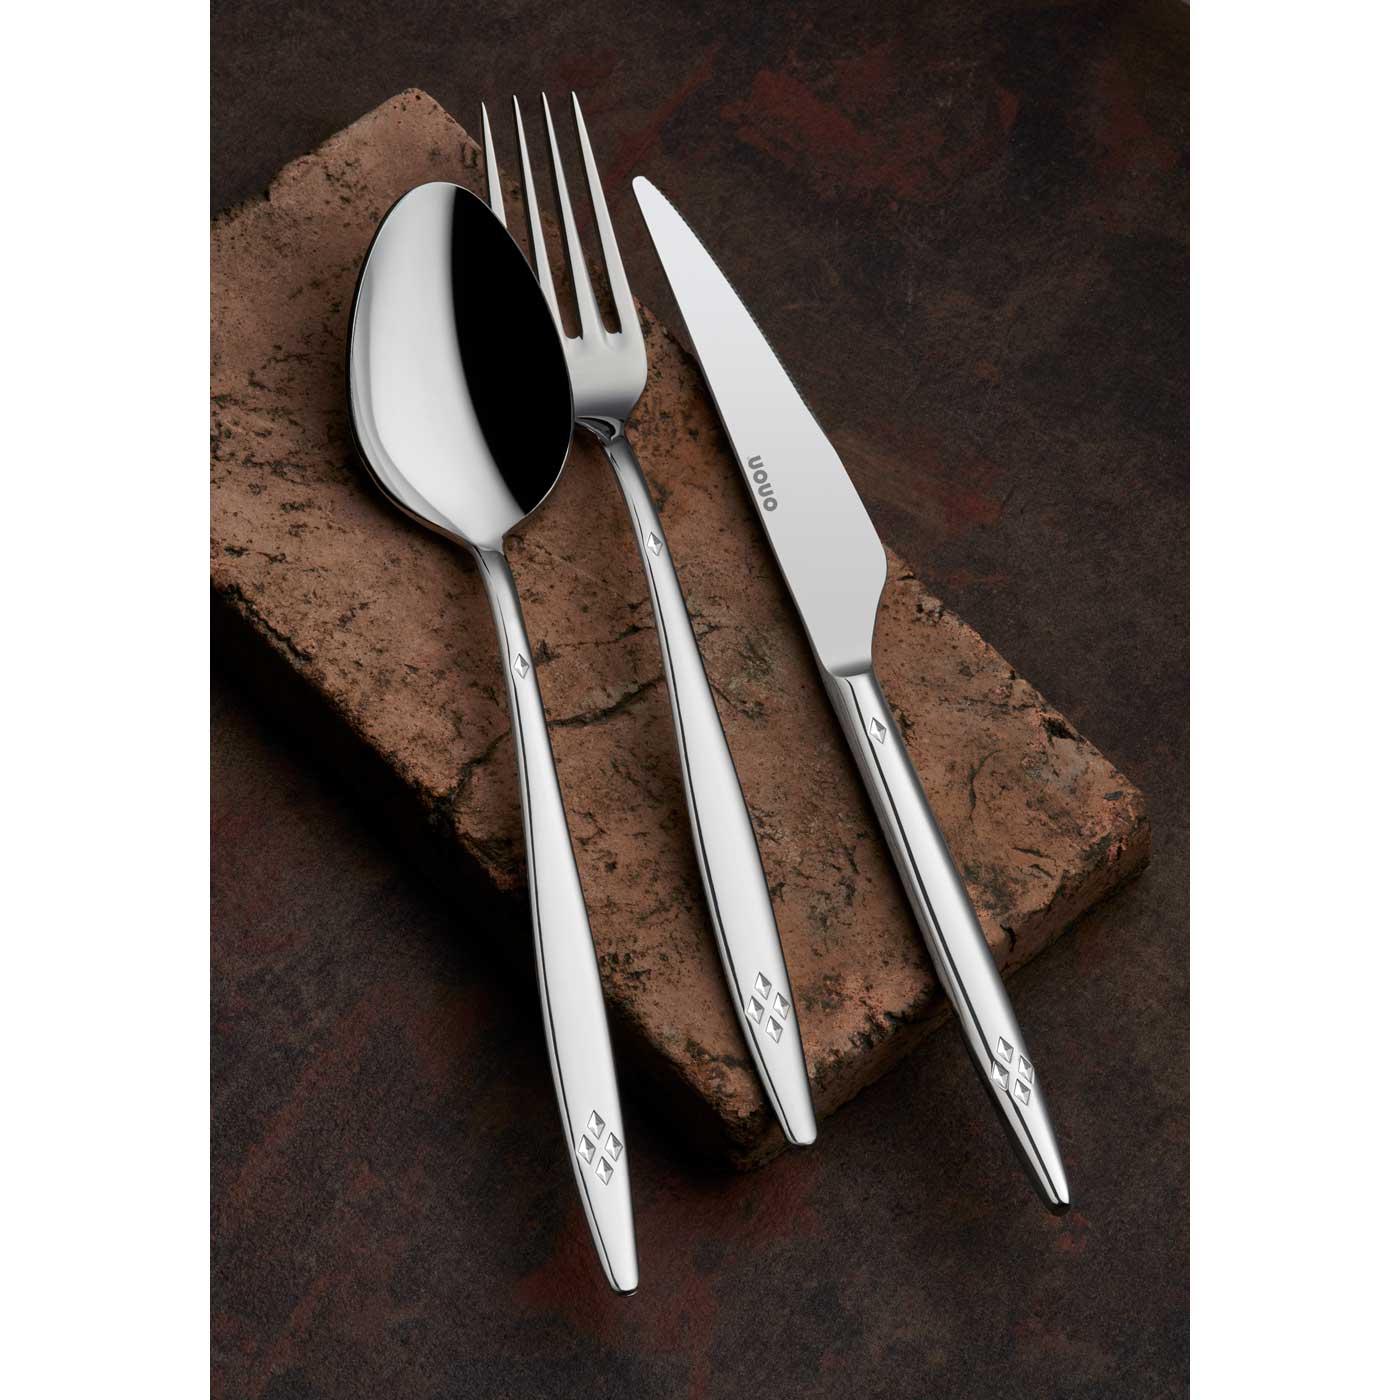 ONON Mira Sade 89 Parça Çatal Kaşık Bıçak Takımı Kutulu 3